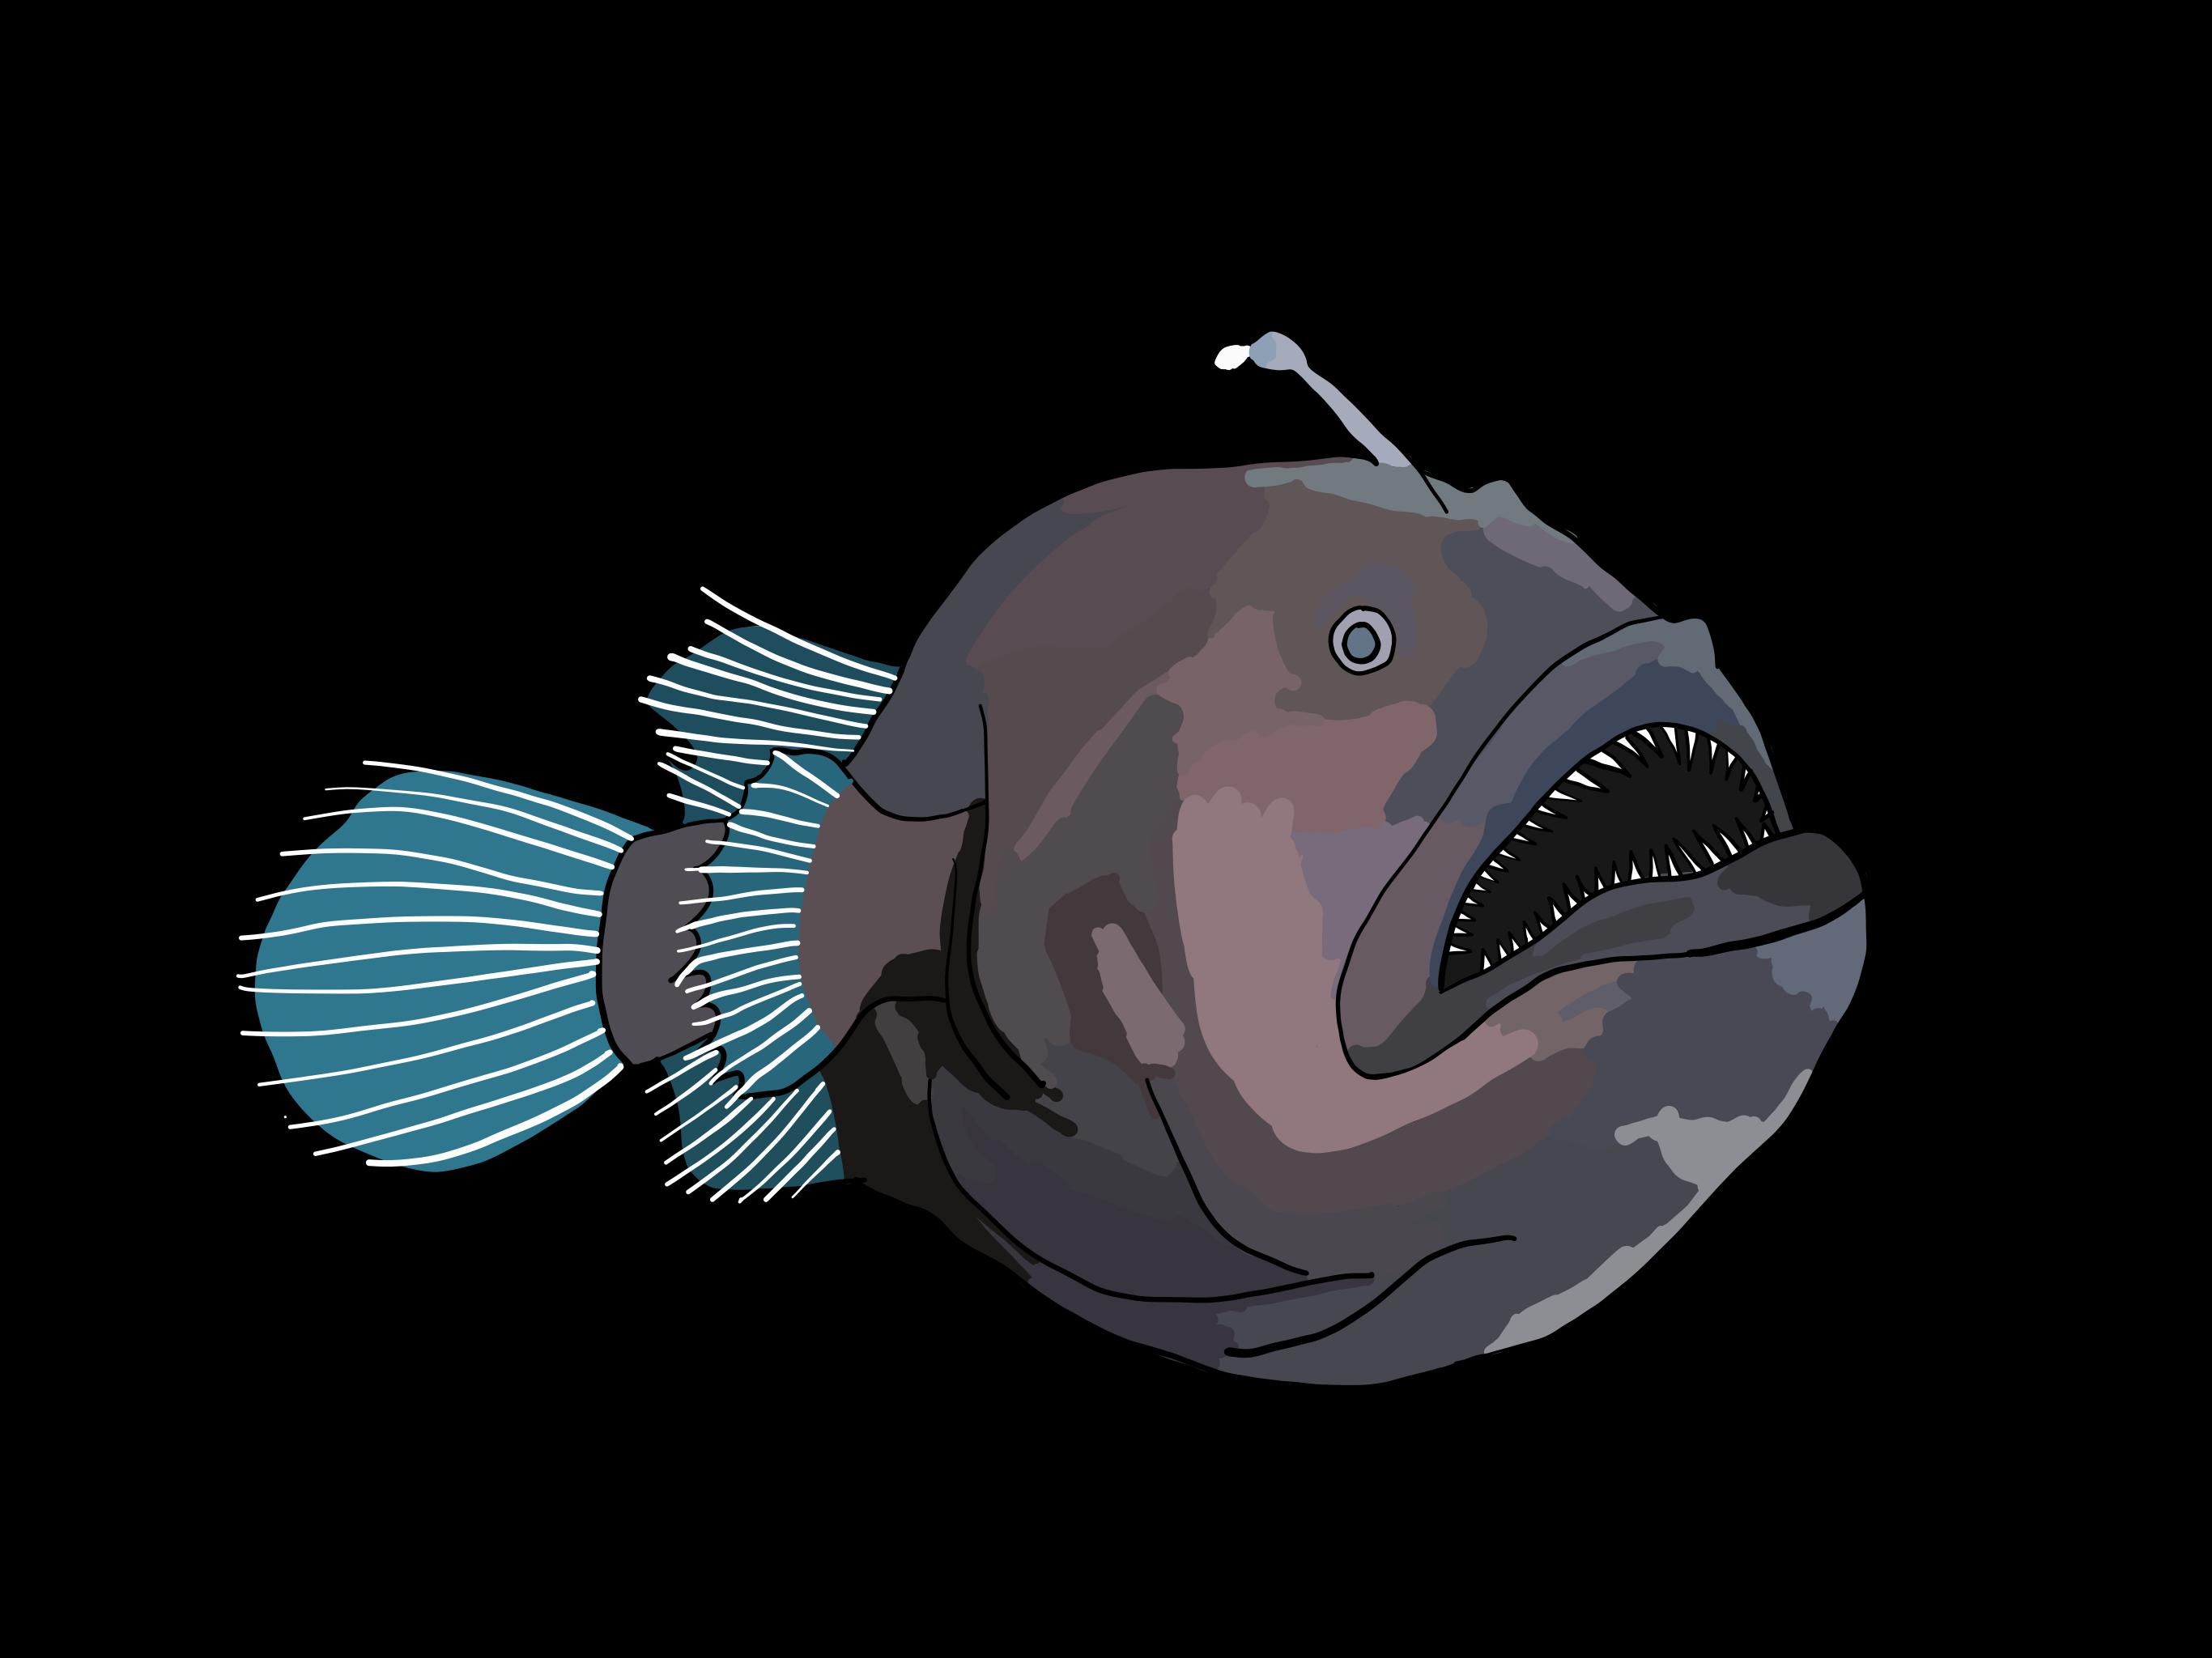 Angler Fish on Black Photo Block   Digital painting sea animals ... for Angler Fish Png  177nar